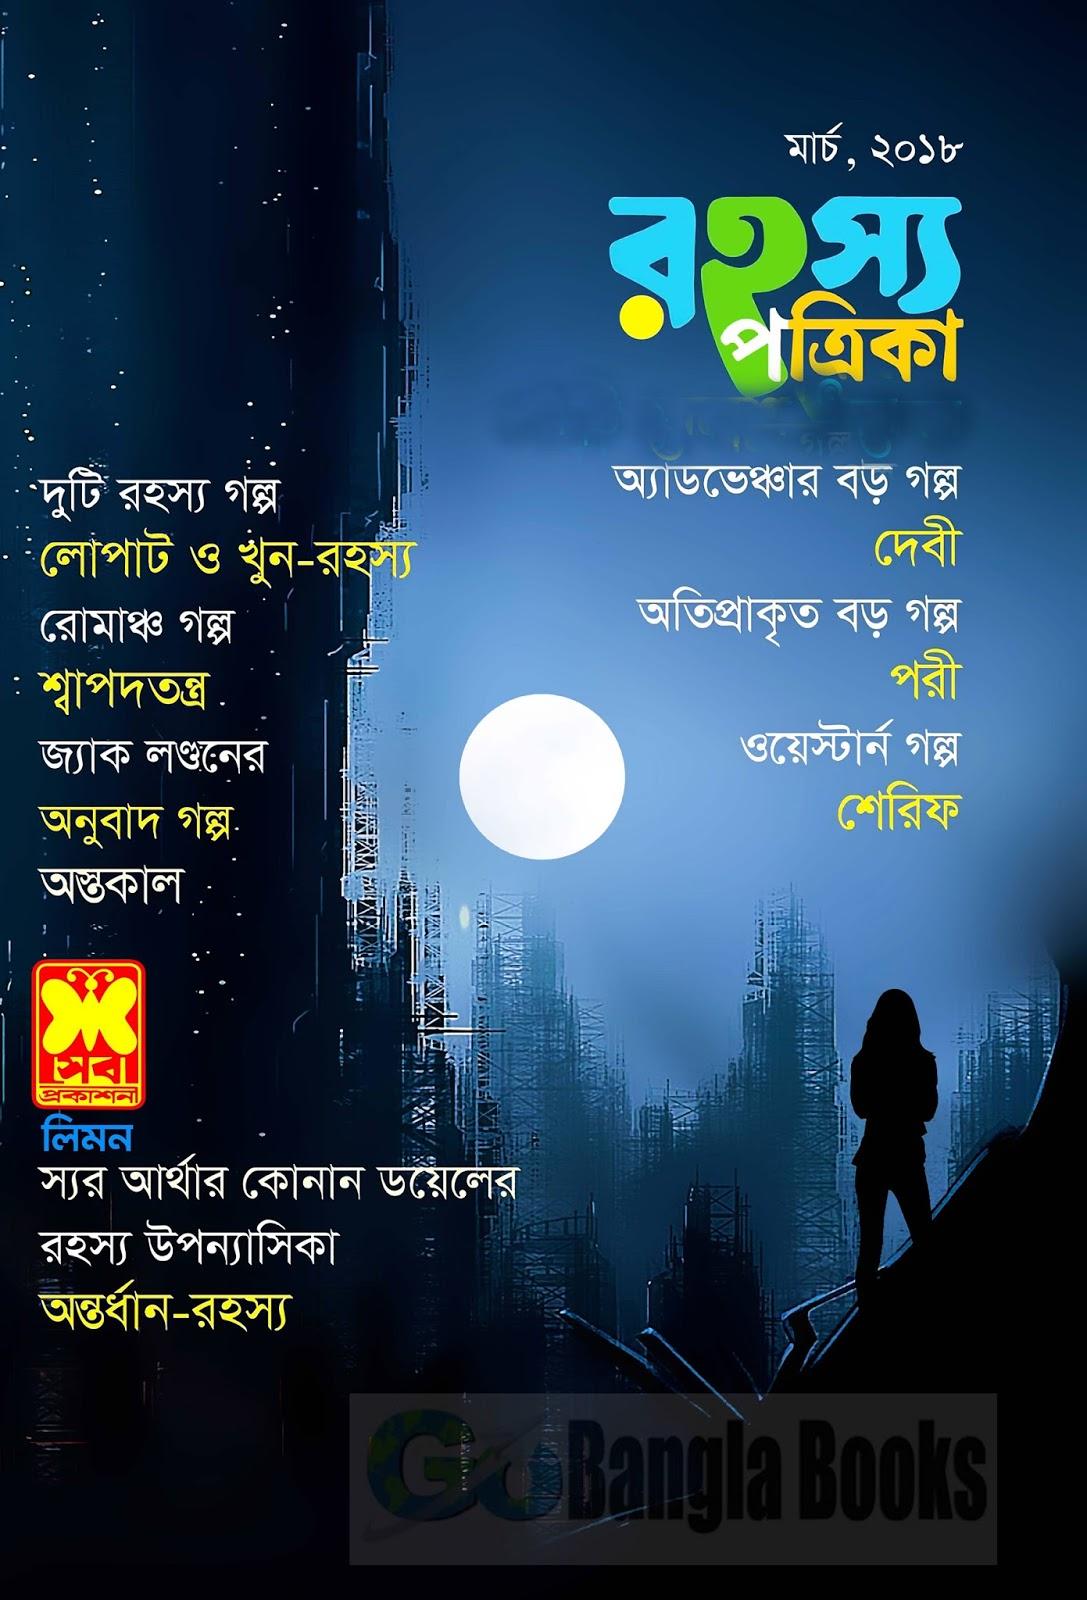 Royal Bengal Rahasya Ebook